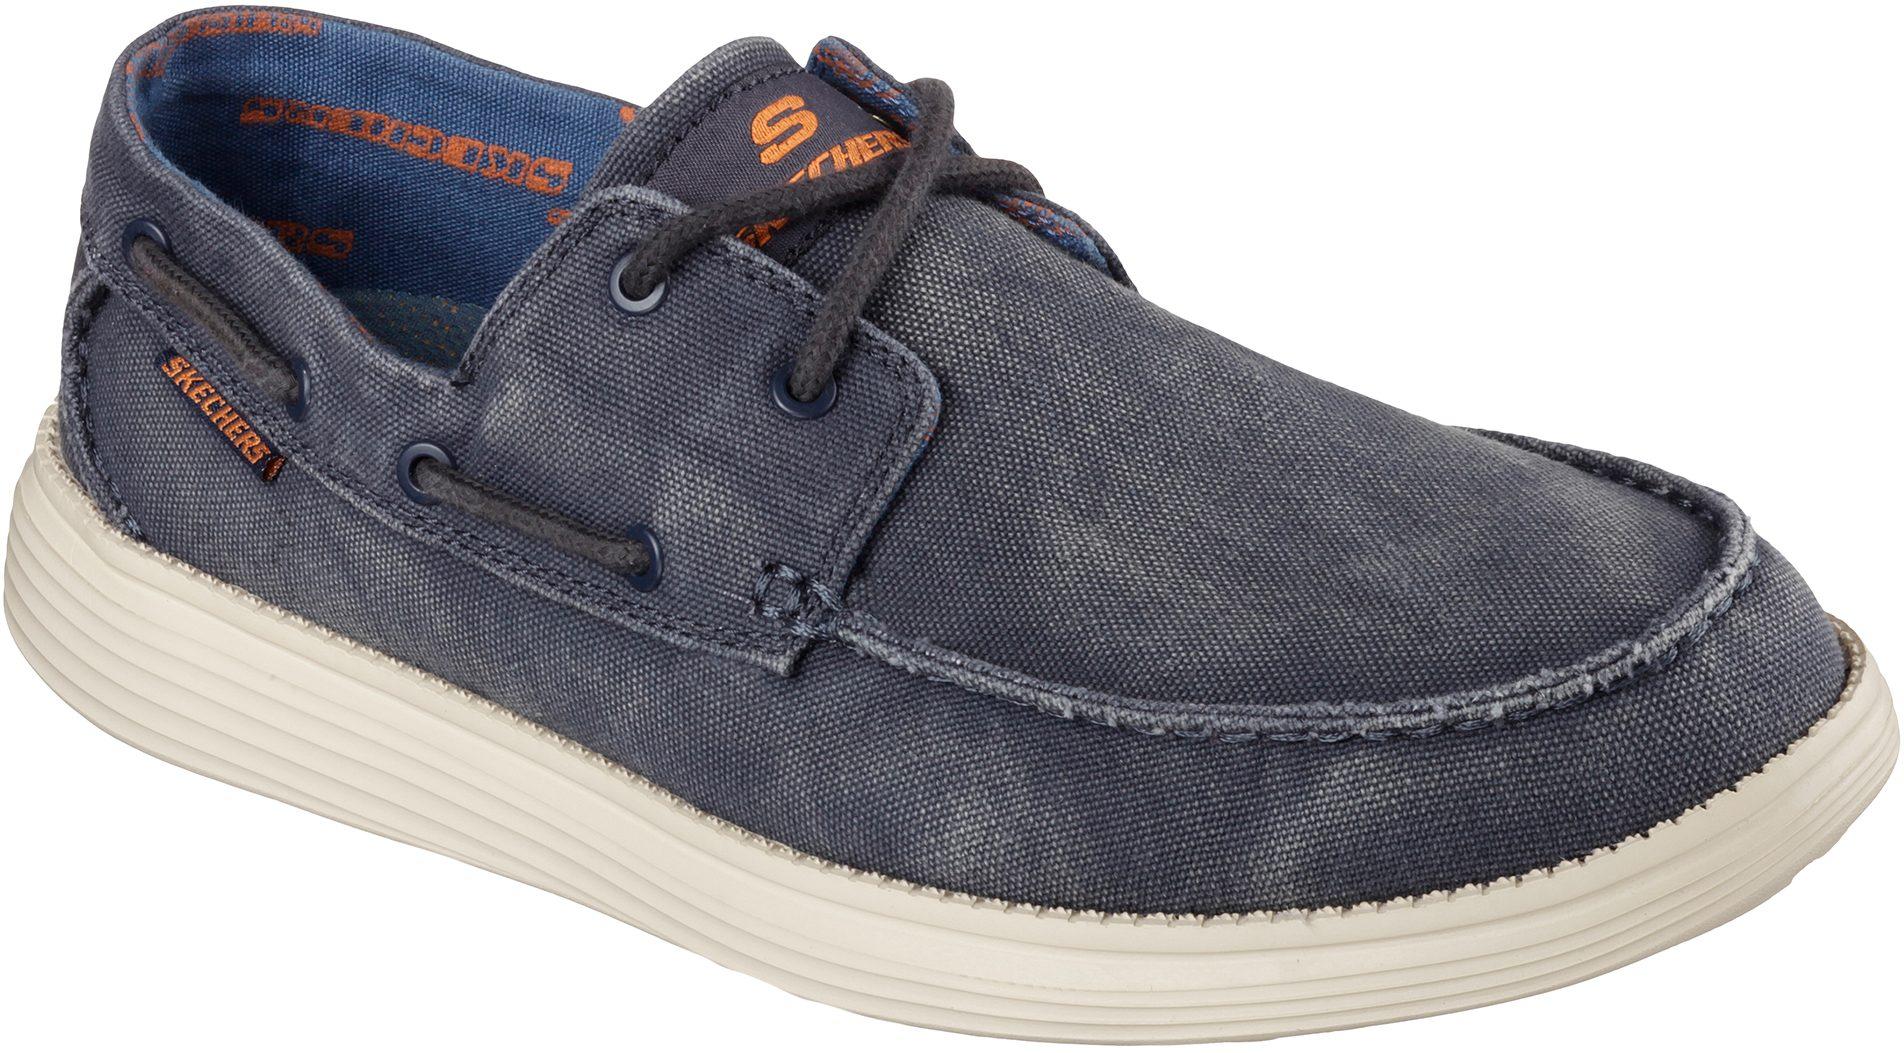 e653eaec5fae Skechers Status - Melec Navy 64644 NVY - Boat Shoes - Humphries Shoes